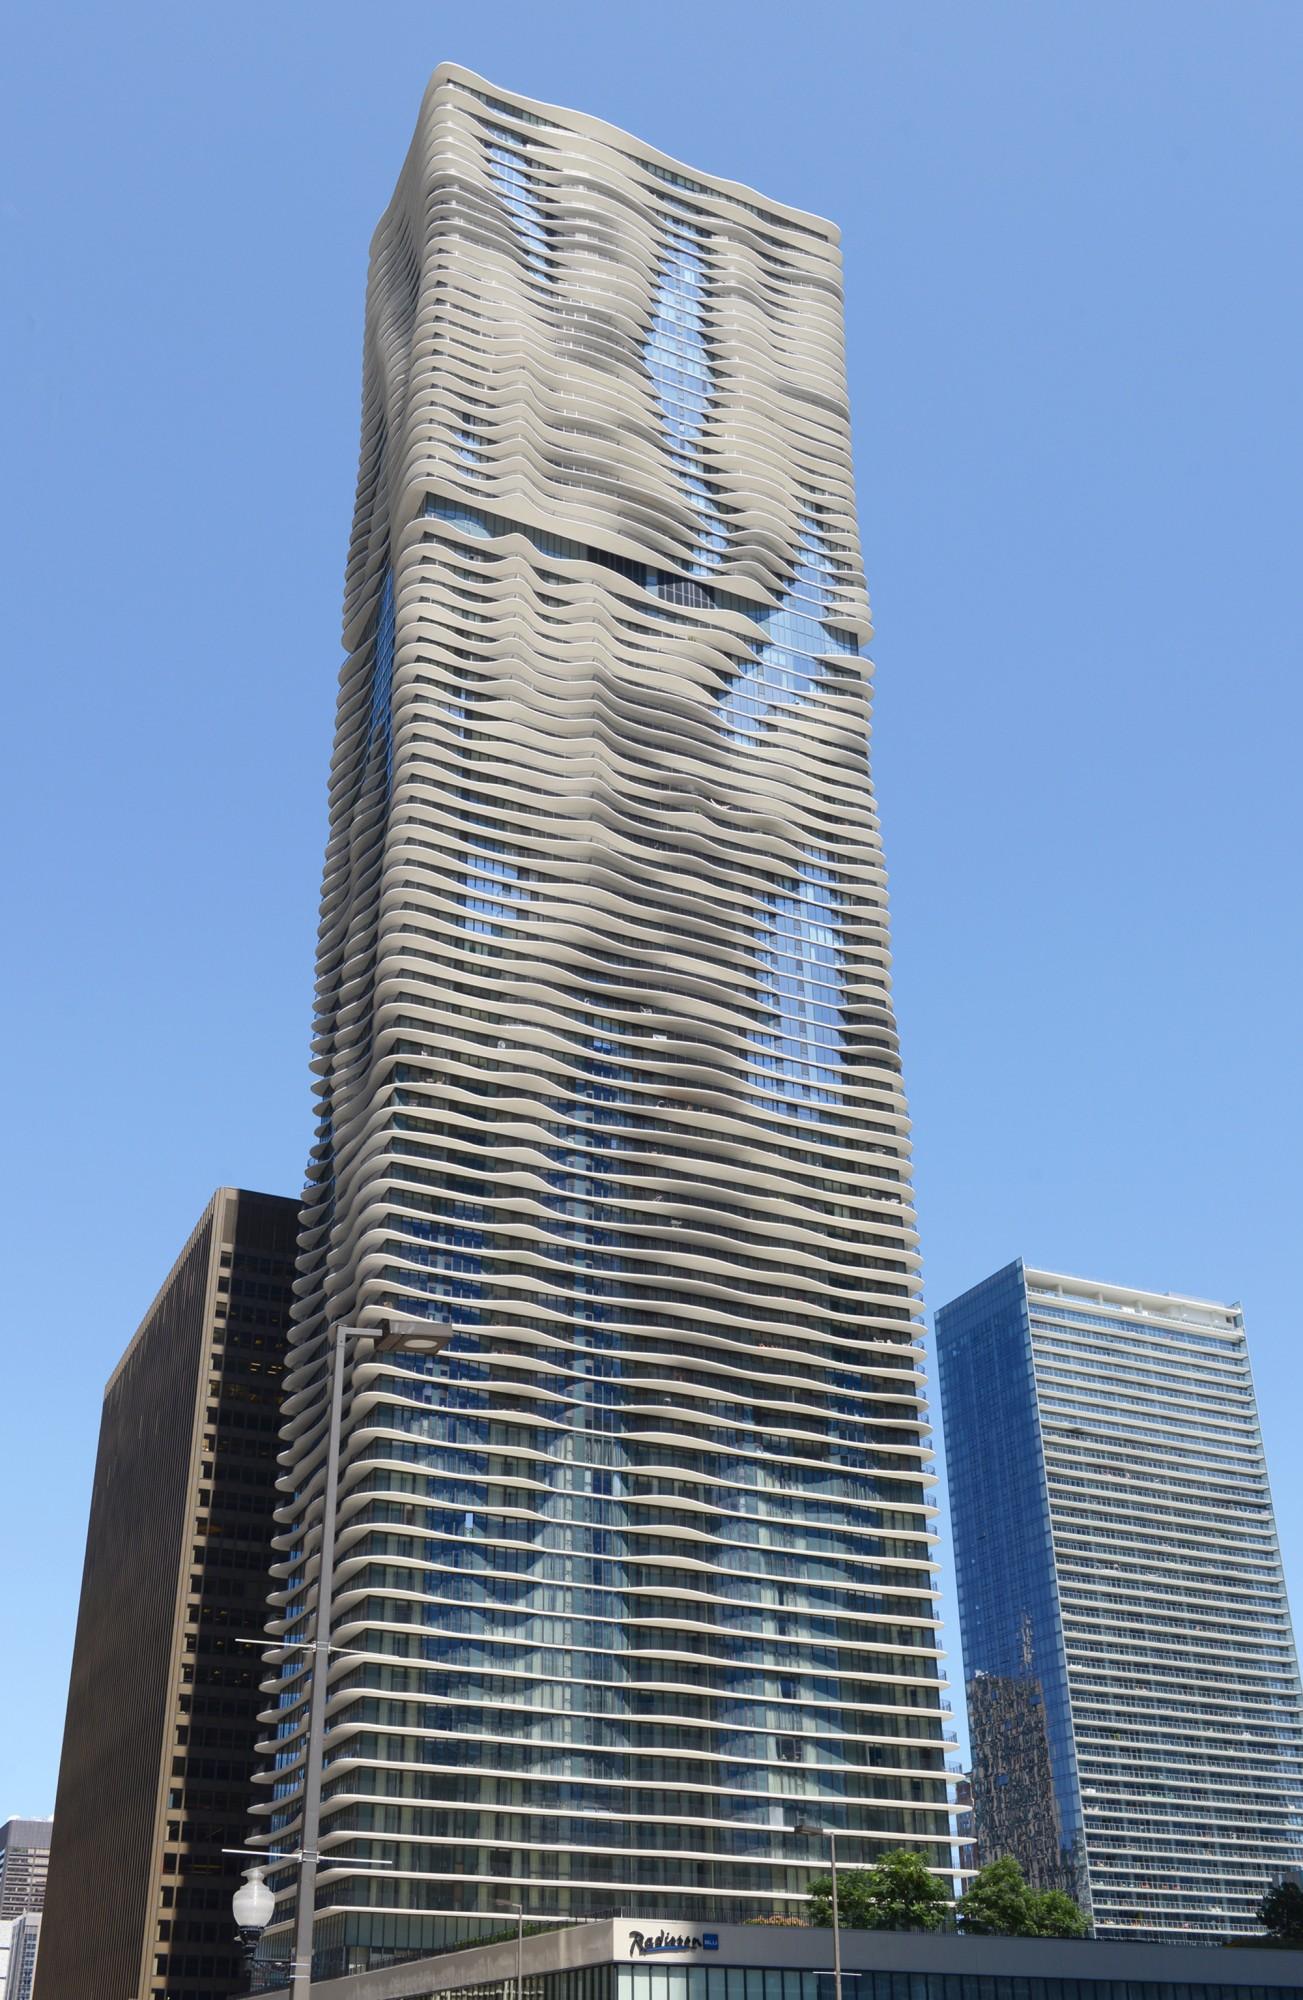 Aqua Buildings Of Chicago Chicago Architecture Foundation